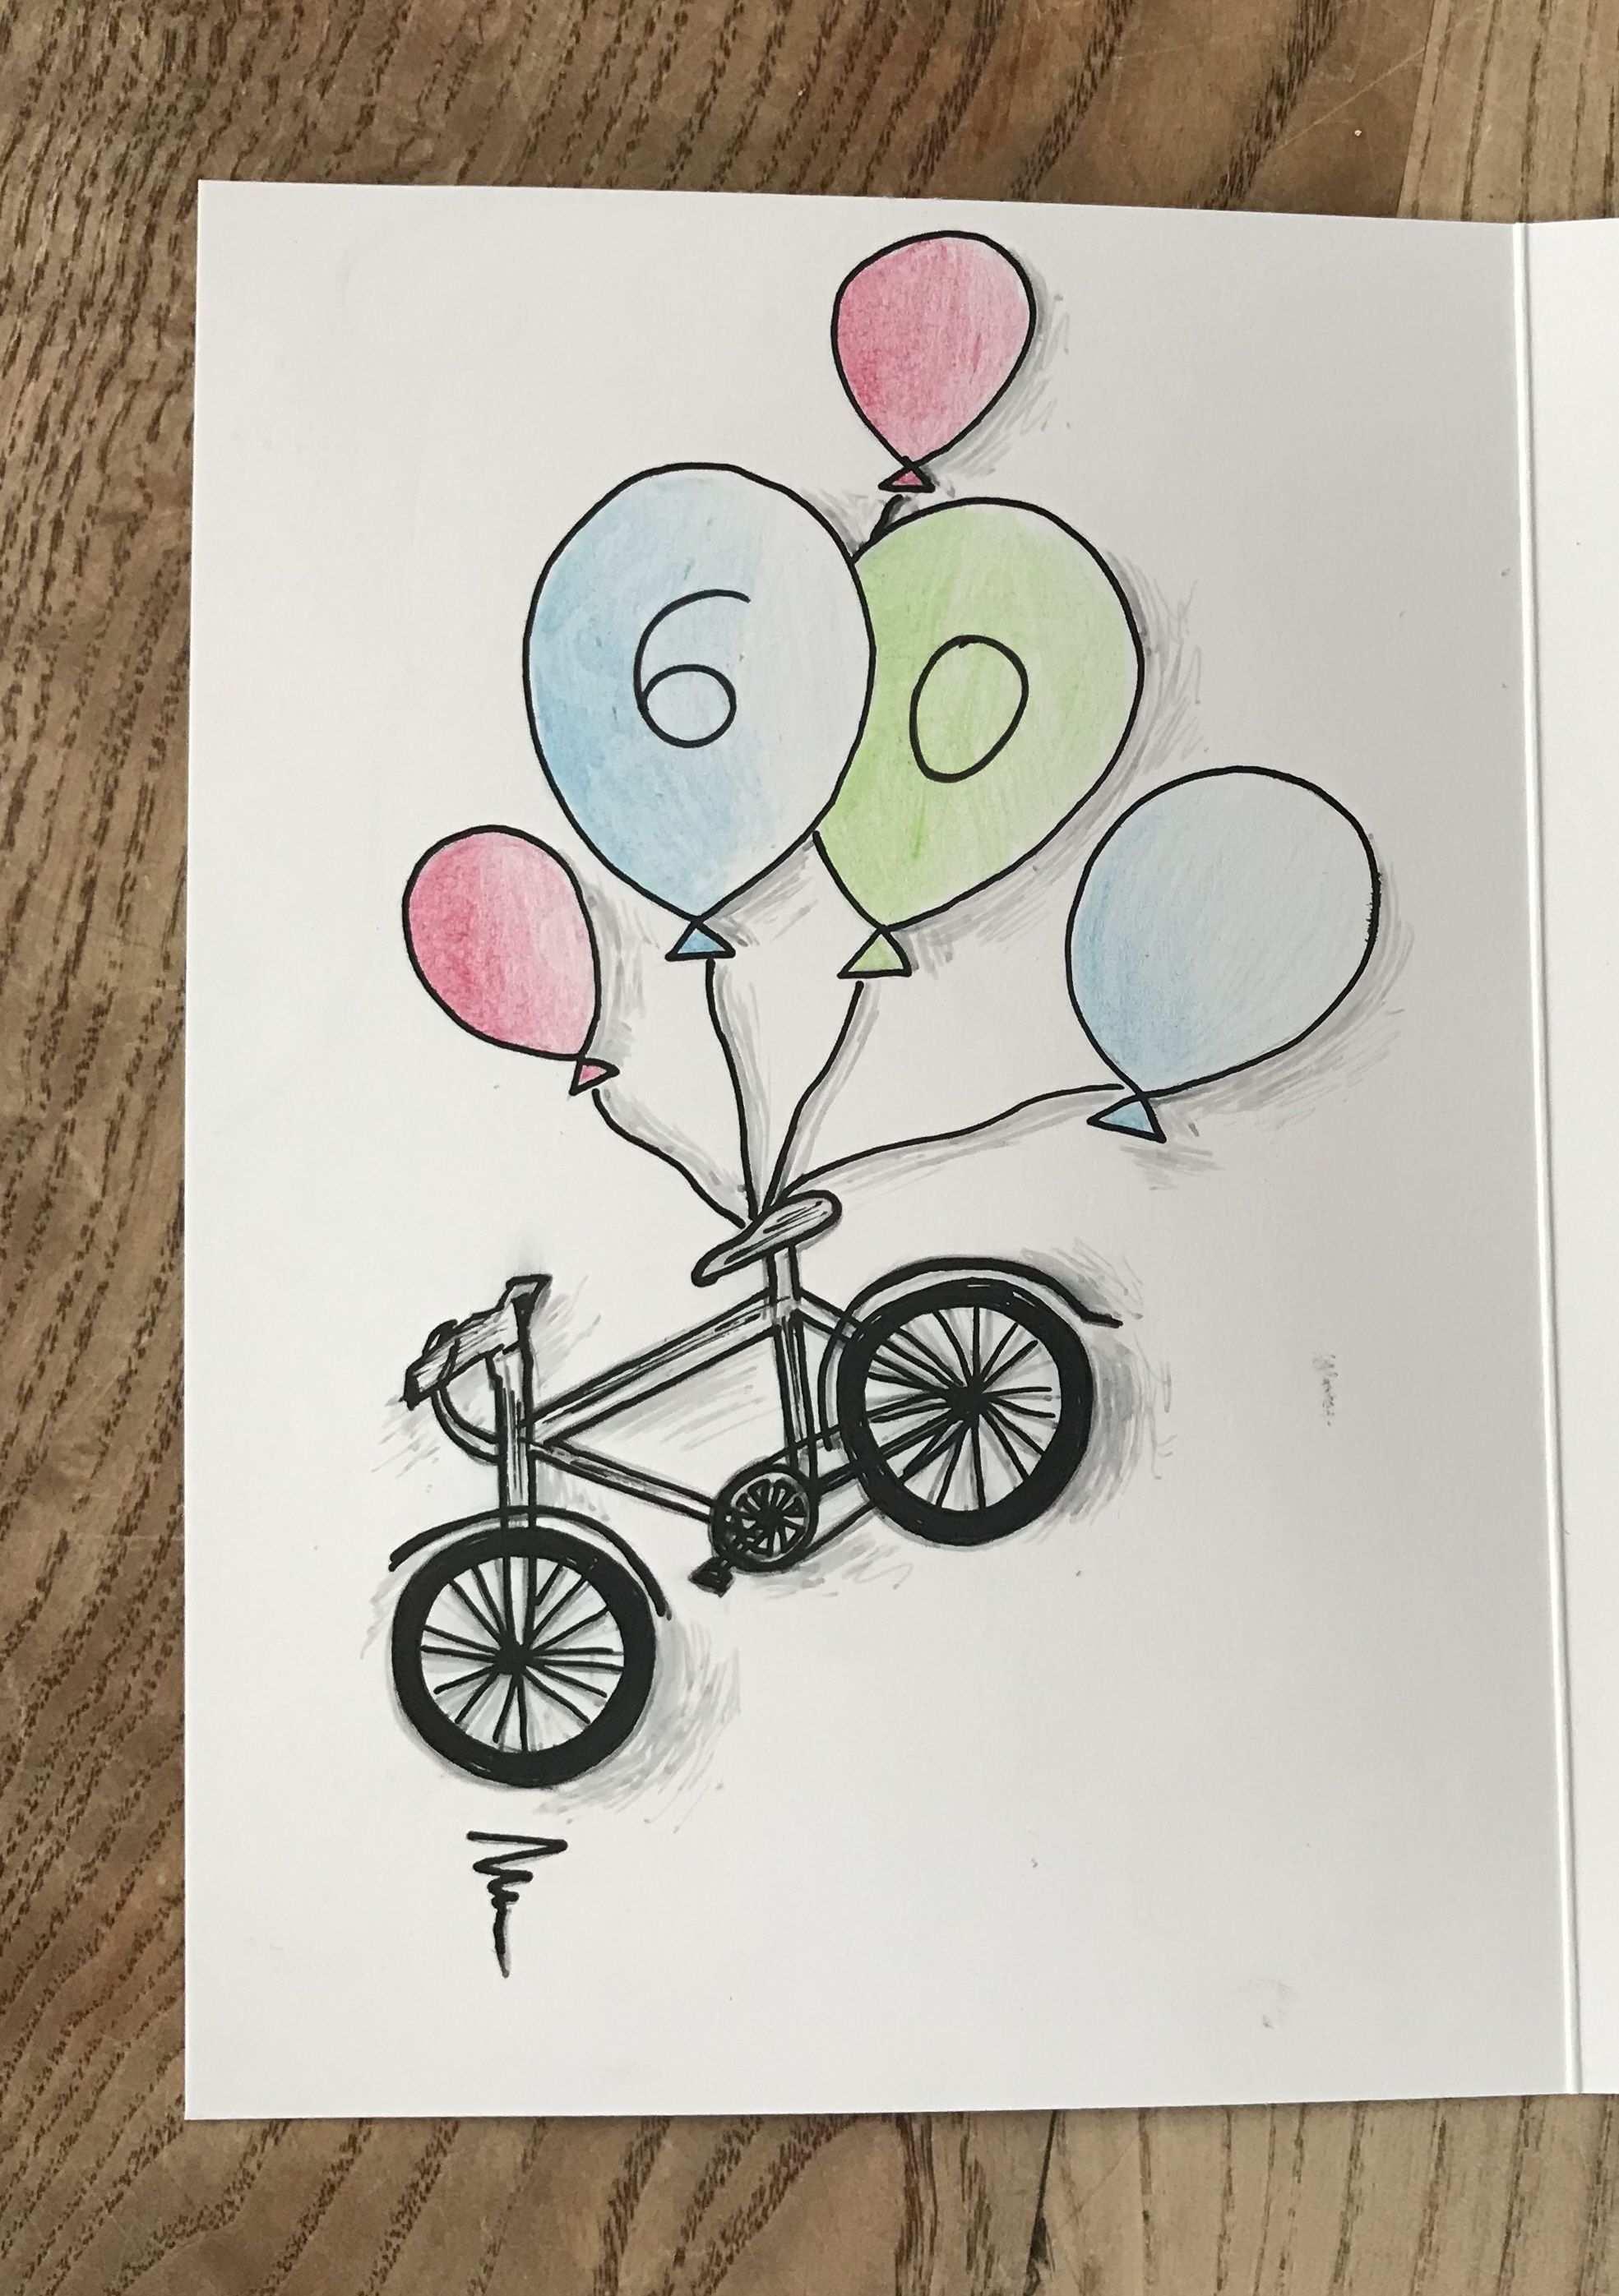 Draw Drawing Birthdaycards Geburtstagskarte Fahrrad Zeichnen Geburtstag Geburtstagskarte Basteln Fahrrad Geldgeschenk Fahrrad Basteln Geburtstagskarte